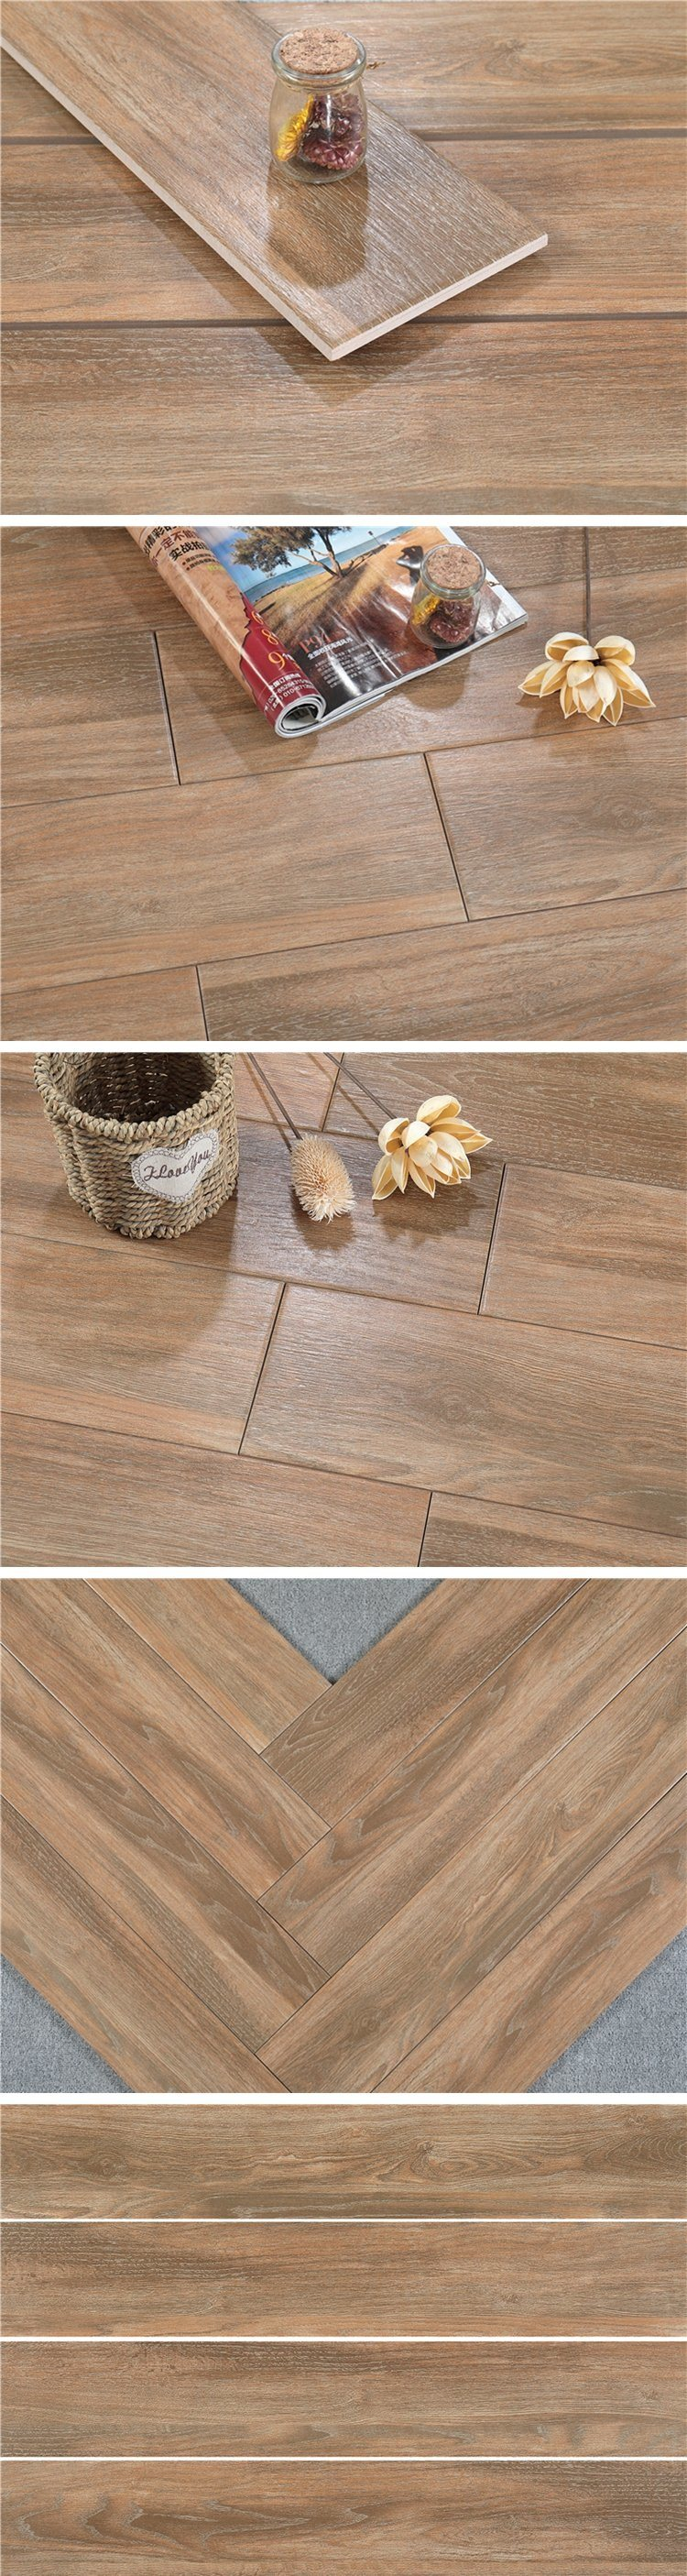 Bathroom Shower Kitchen Floor 150x900mm Porcelain Wood Tile Canada China Ceramic Wood Tile Wood Look Tile Made In China Com